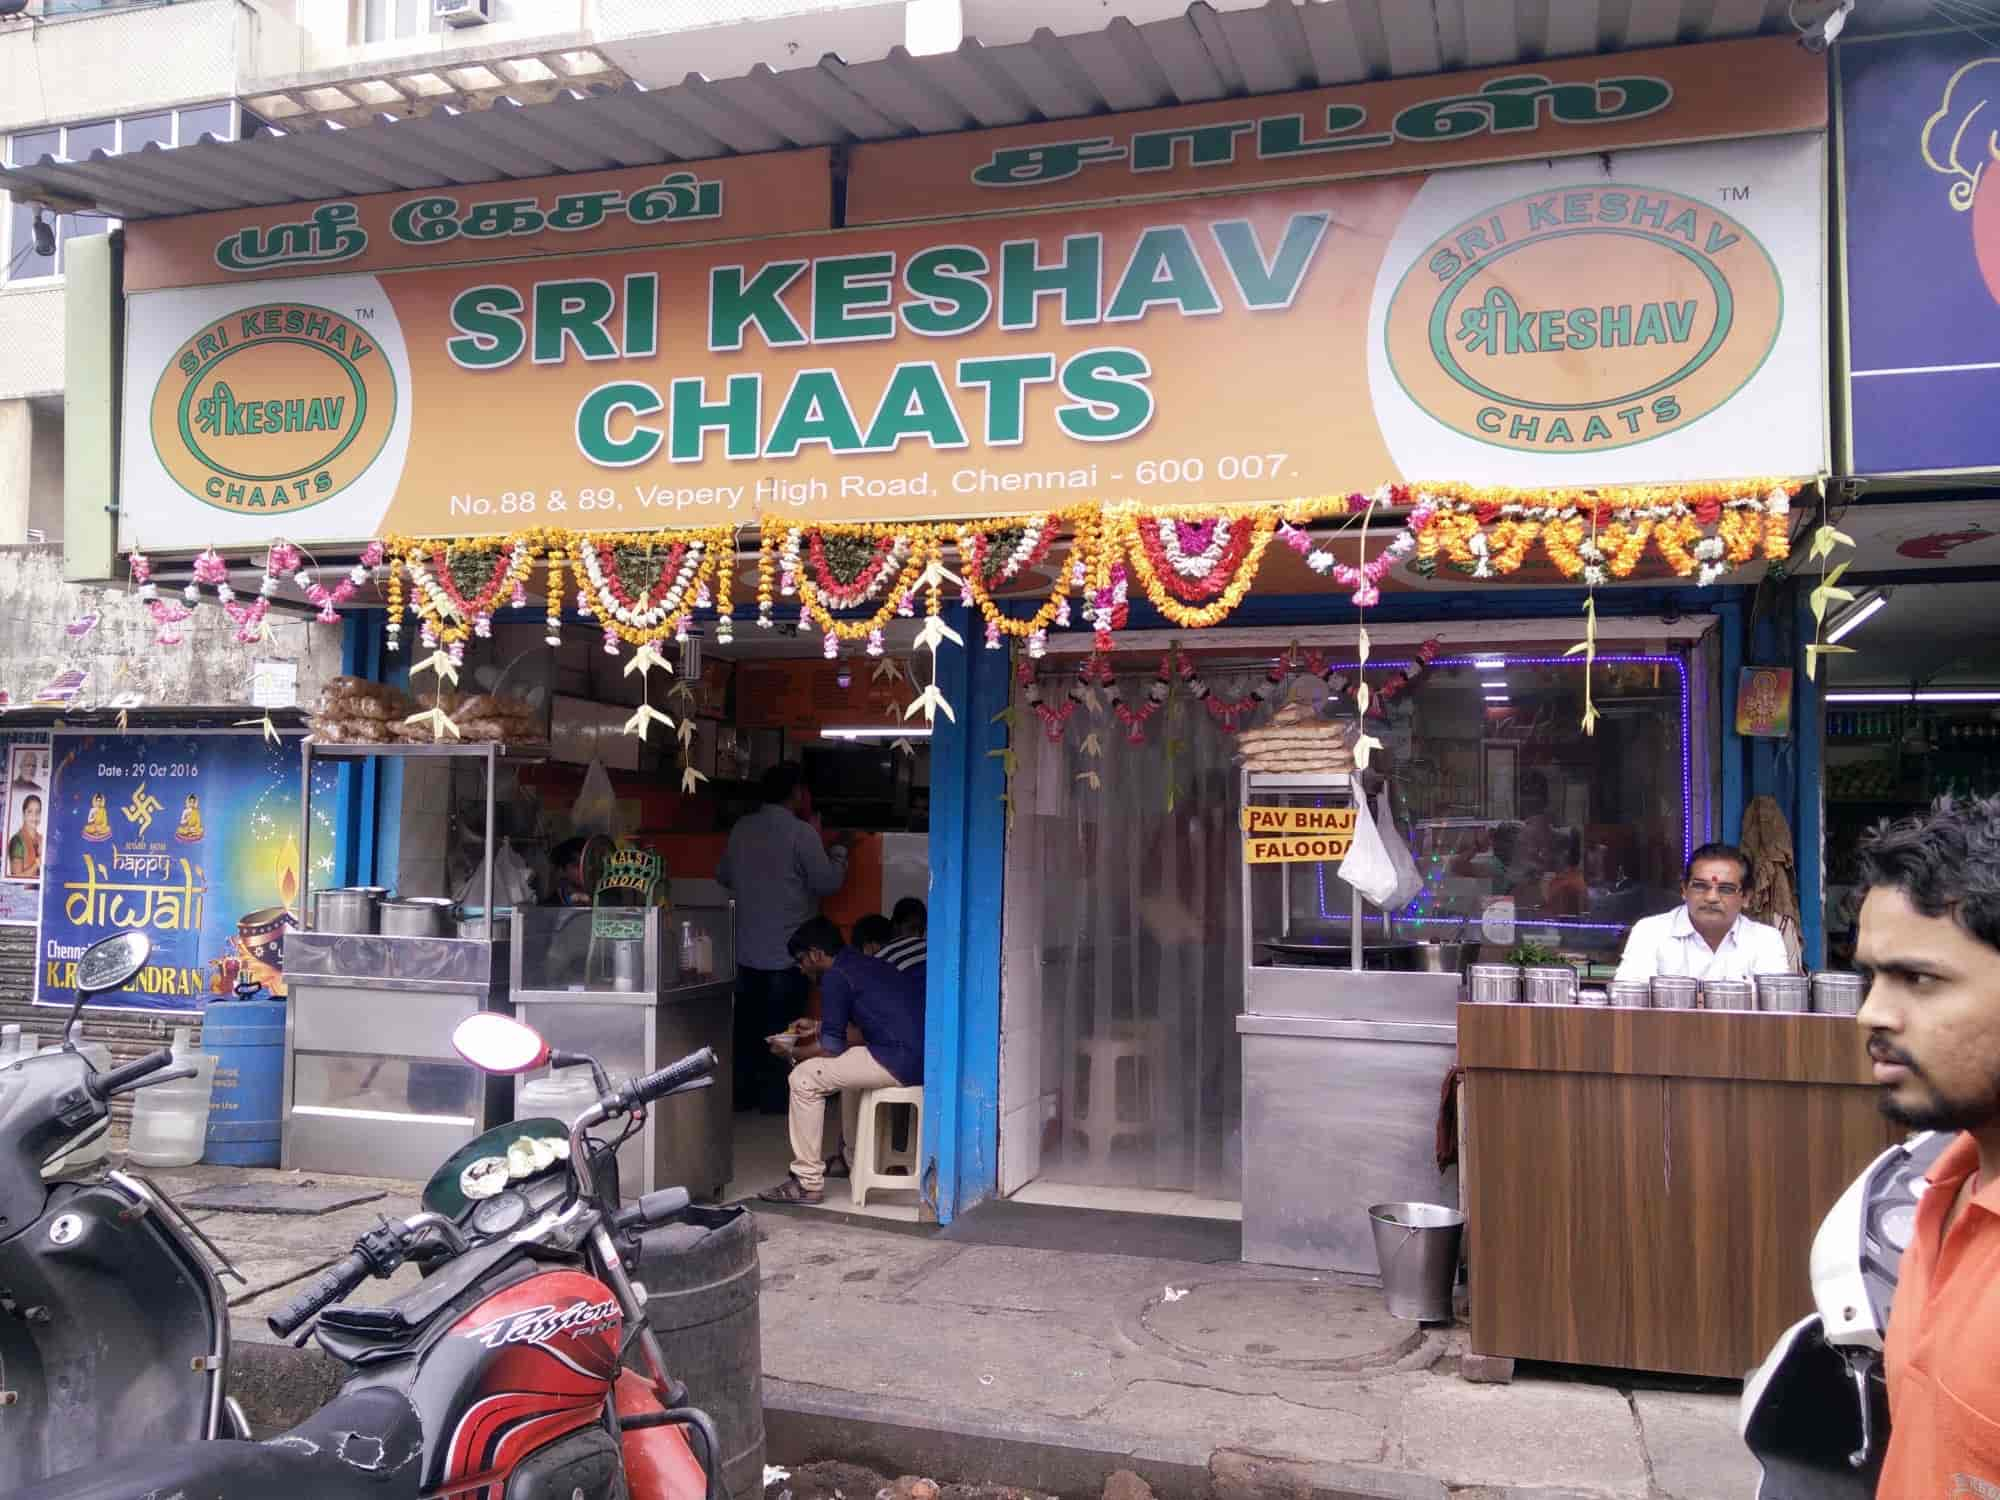 Sri Keshav Chats